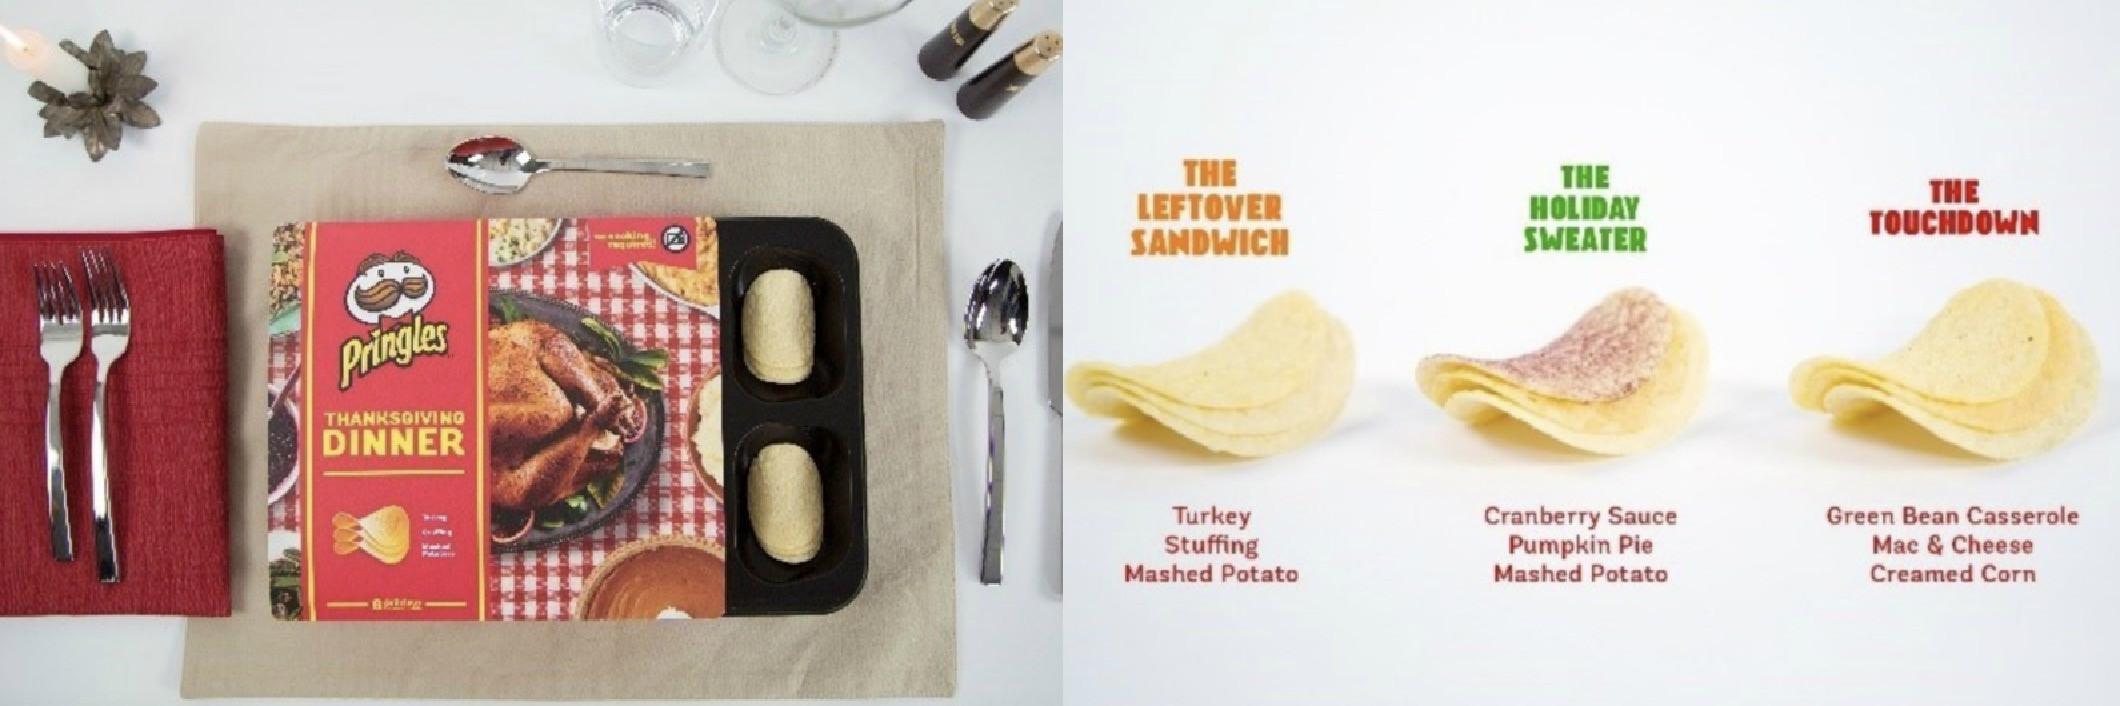 Thanksgiving Dinner Pringles  Pringles Recreates Thanksgiving Dinner With Eight New Chip